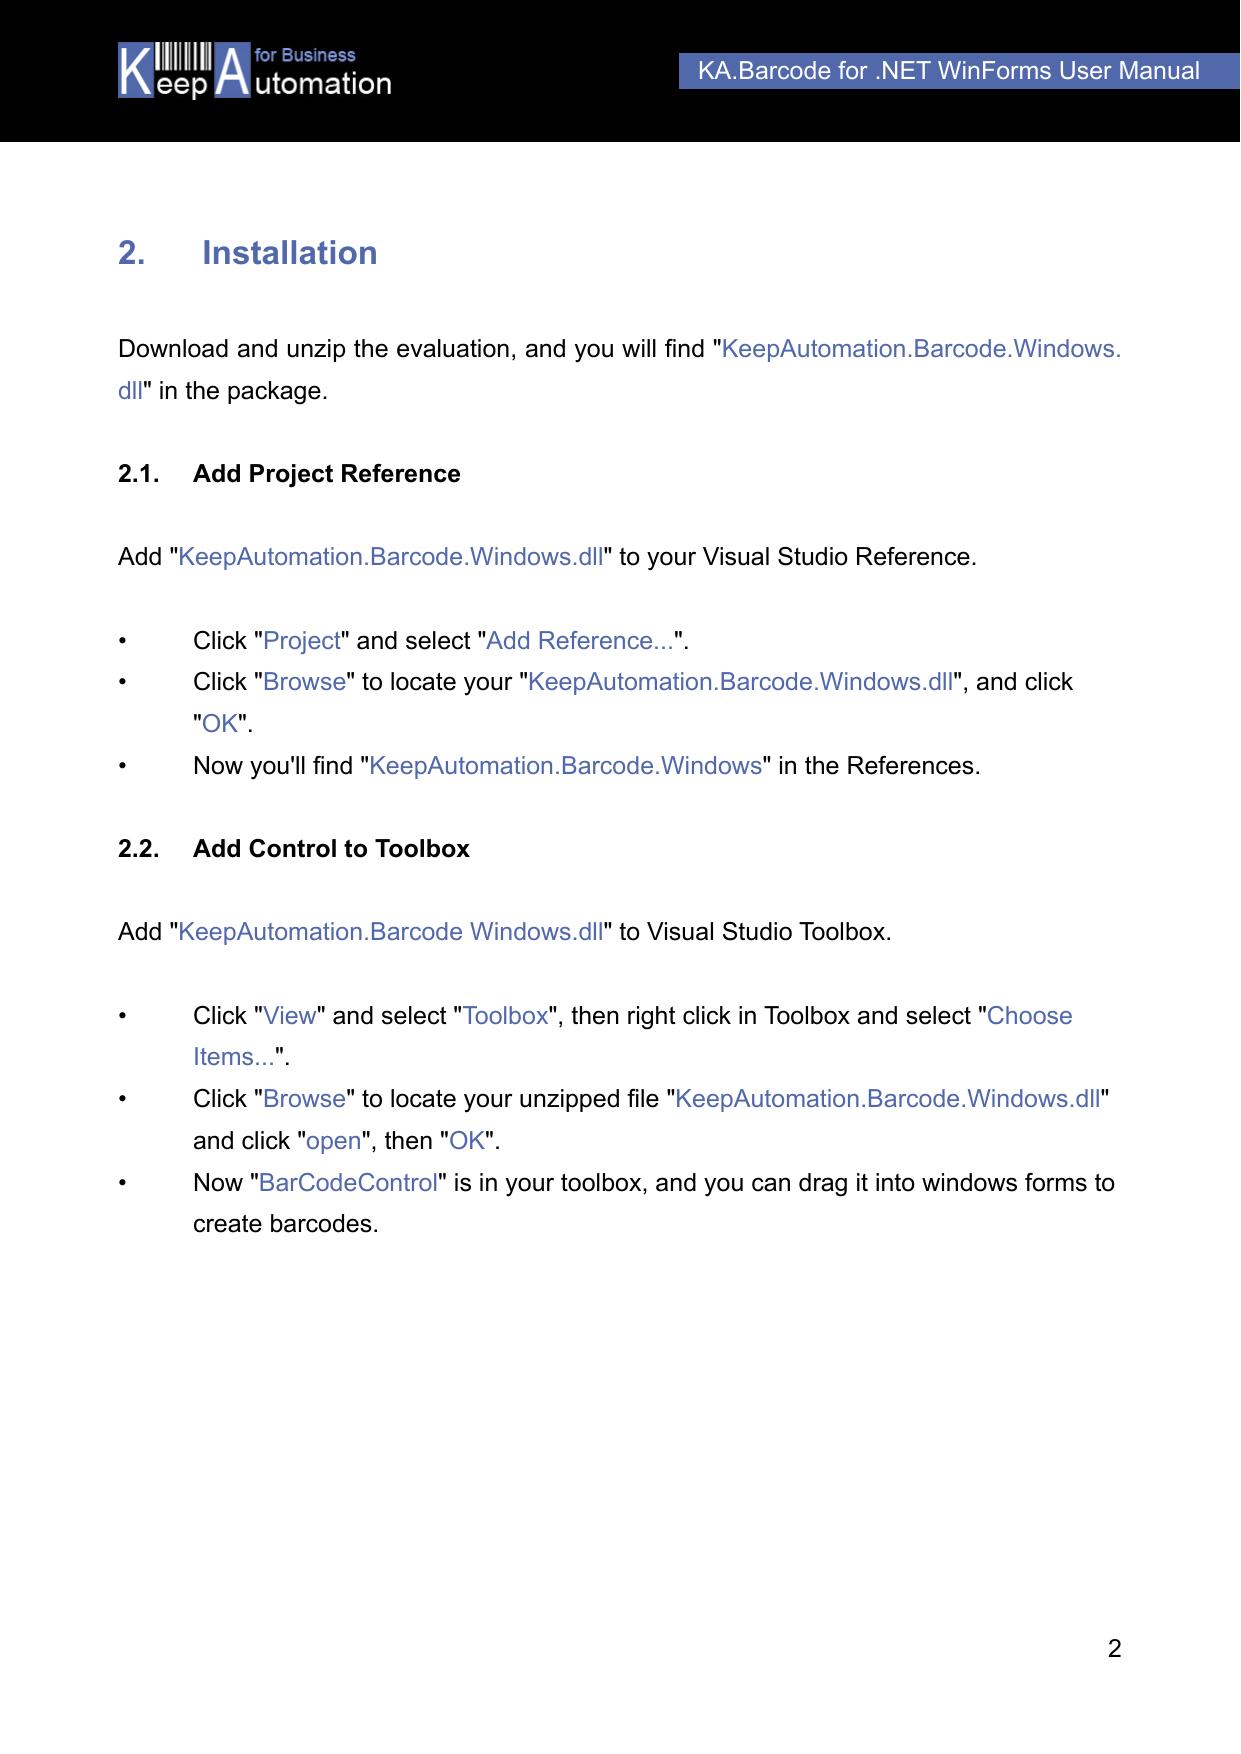 KA Barcode For  NET WinForms User Manual